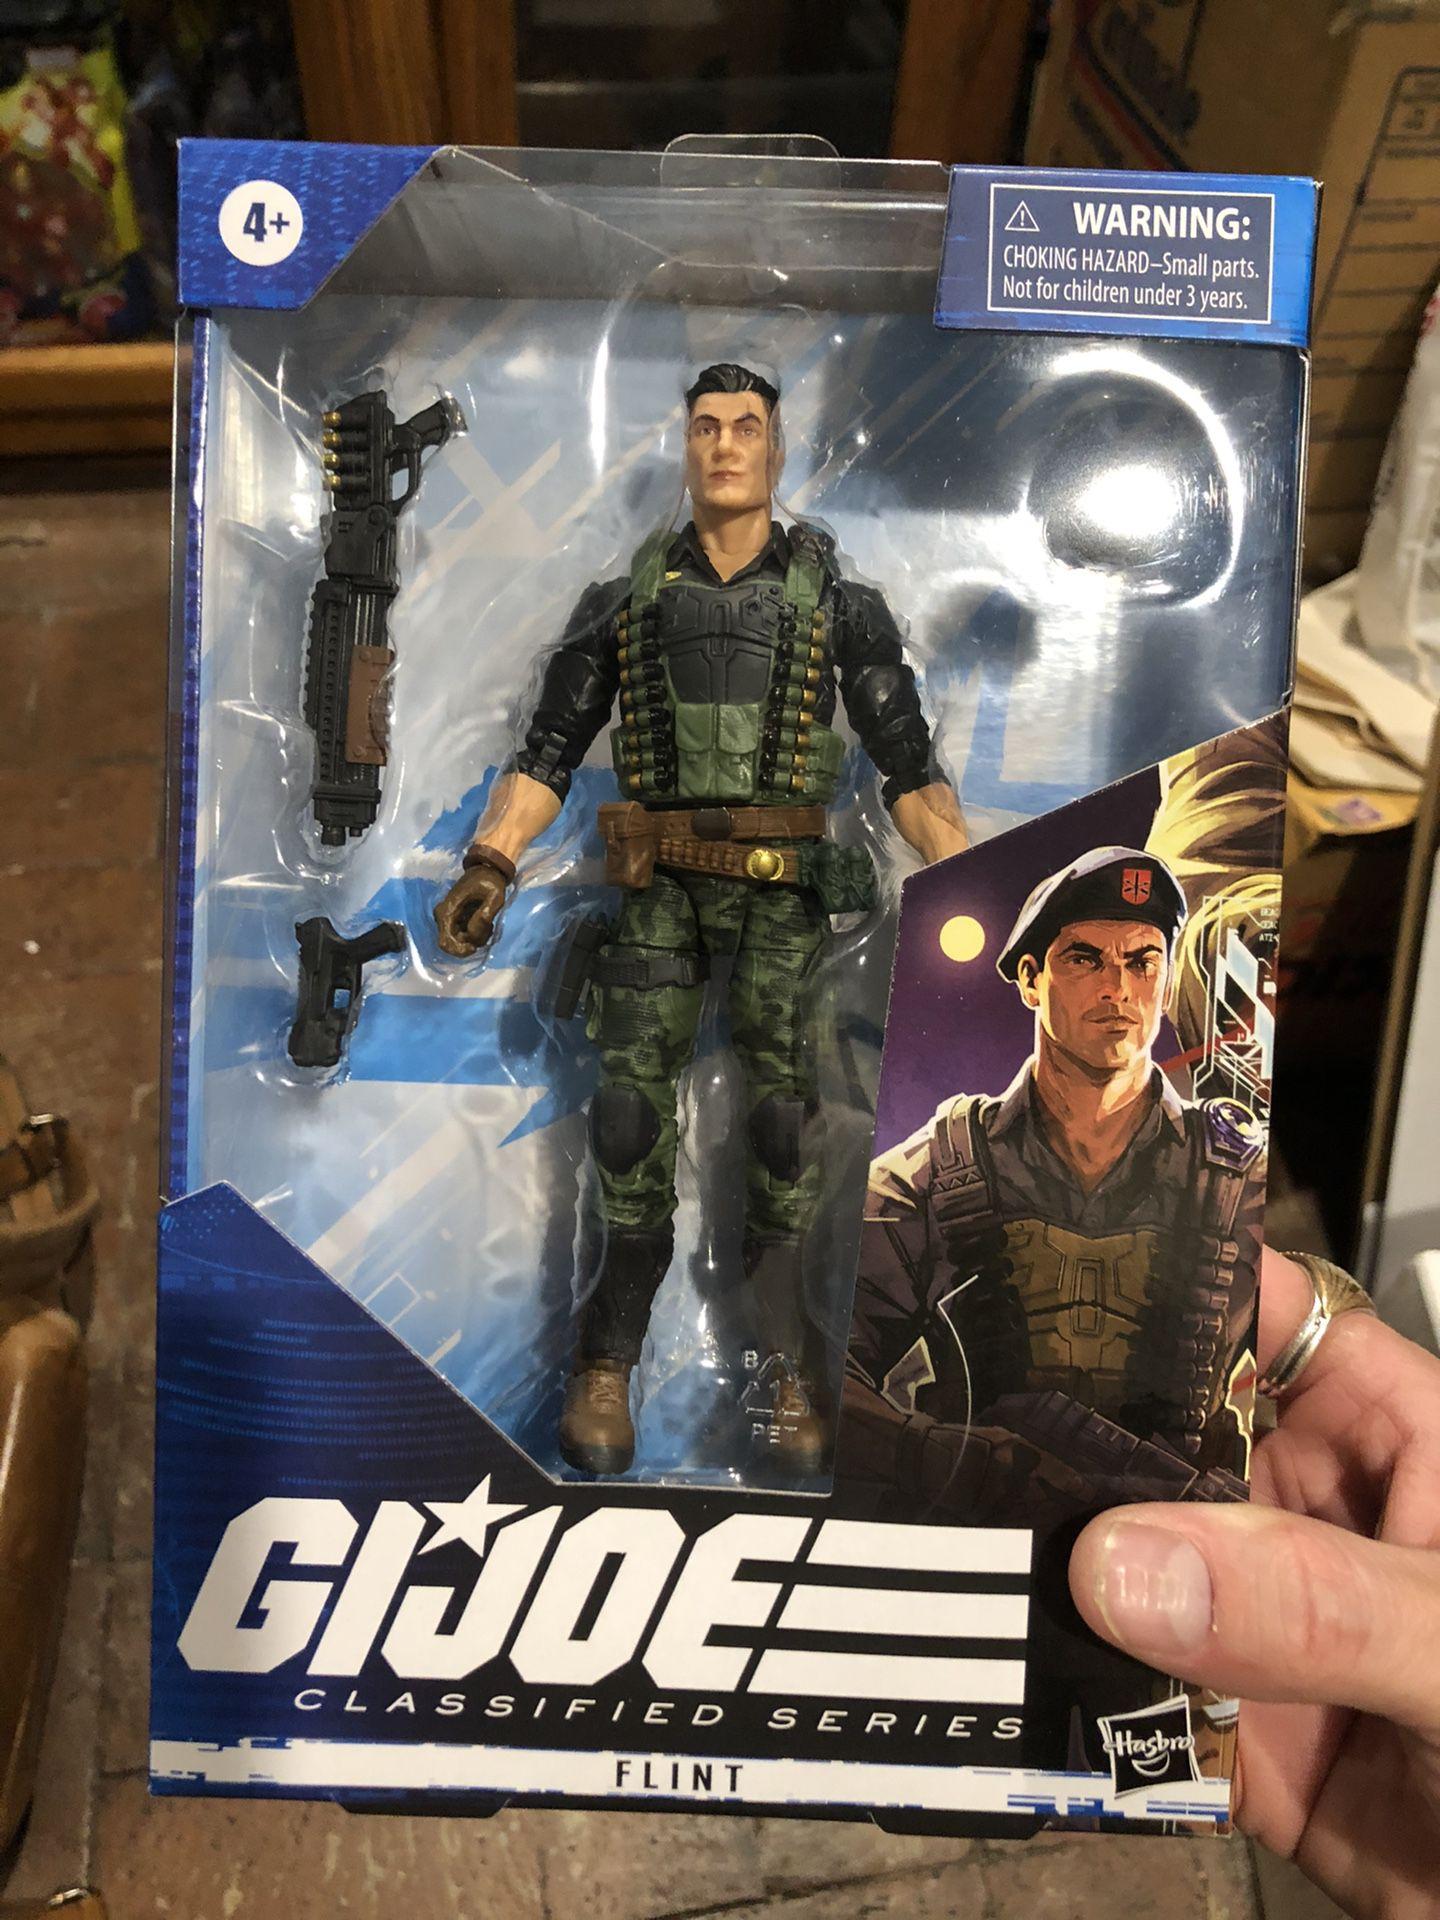 GI Joe Classified Series Flint Action Figure